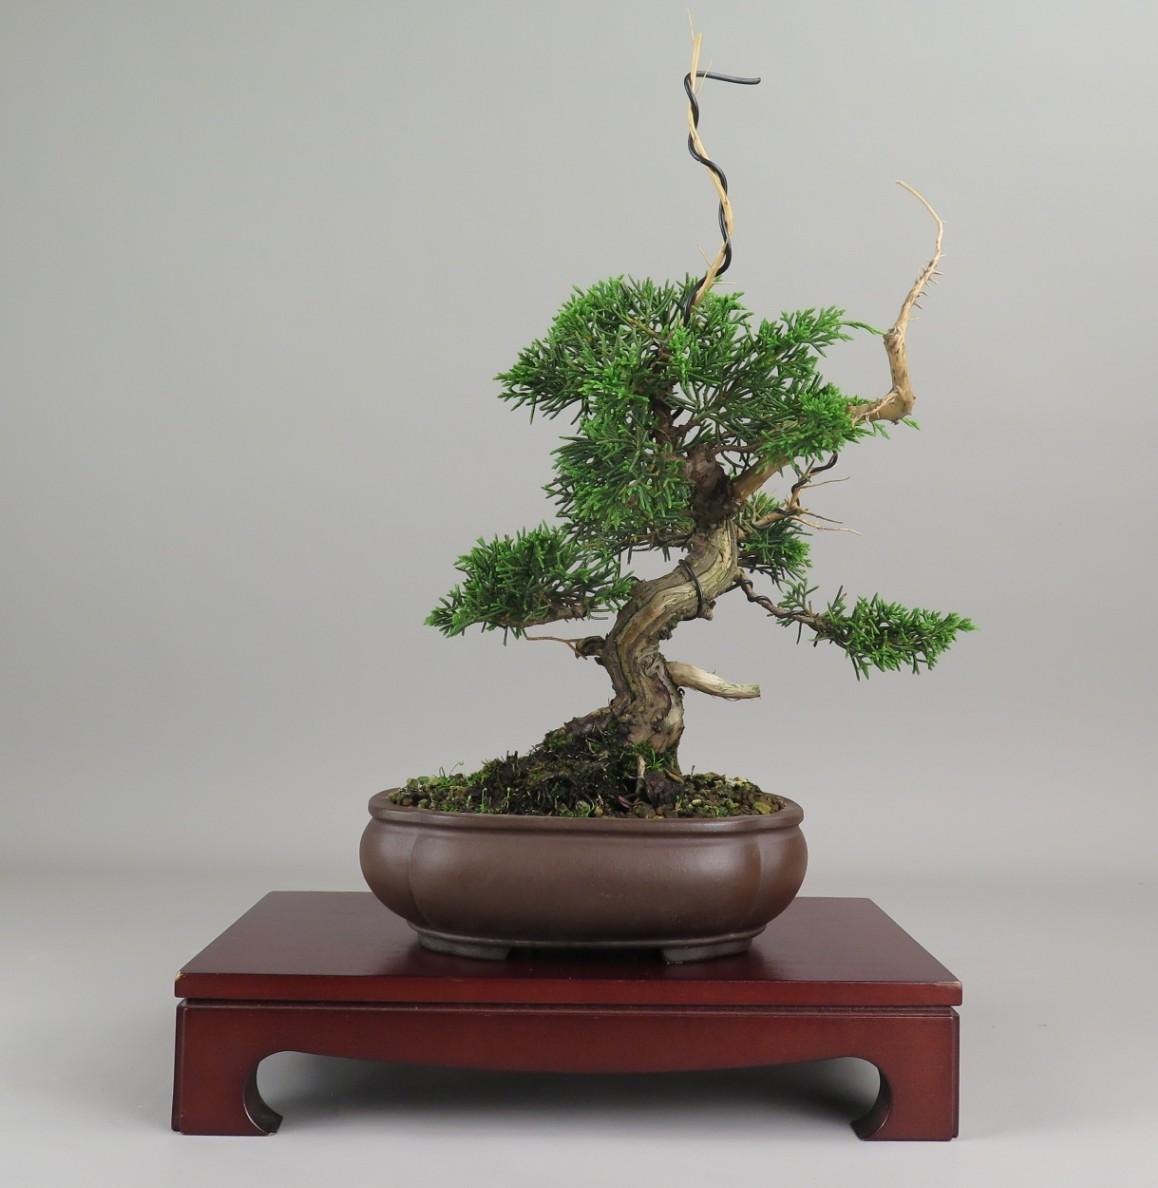 Bonsai de juniperus chinensis, frente